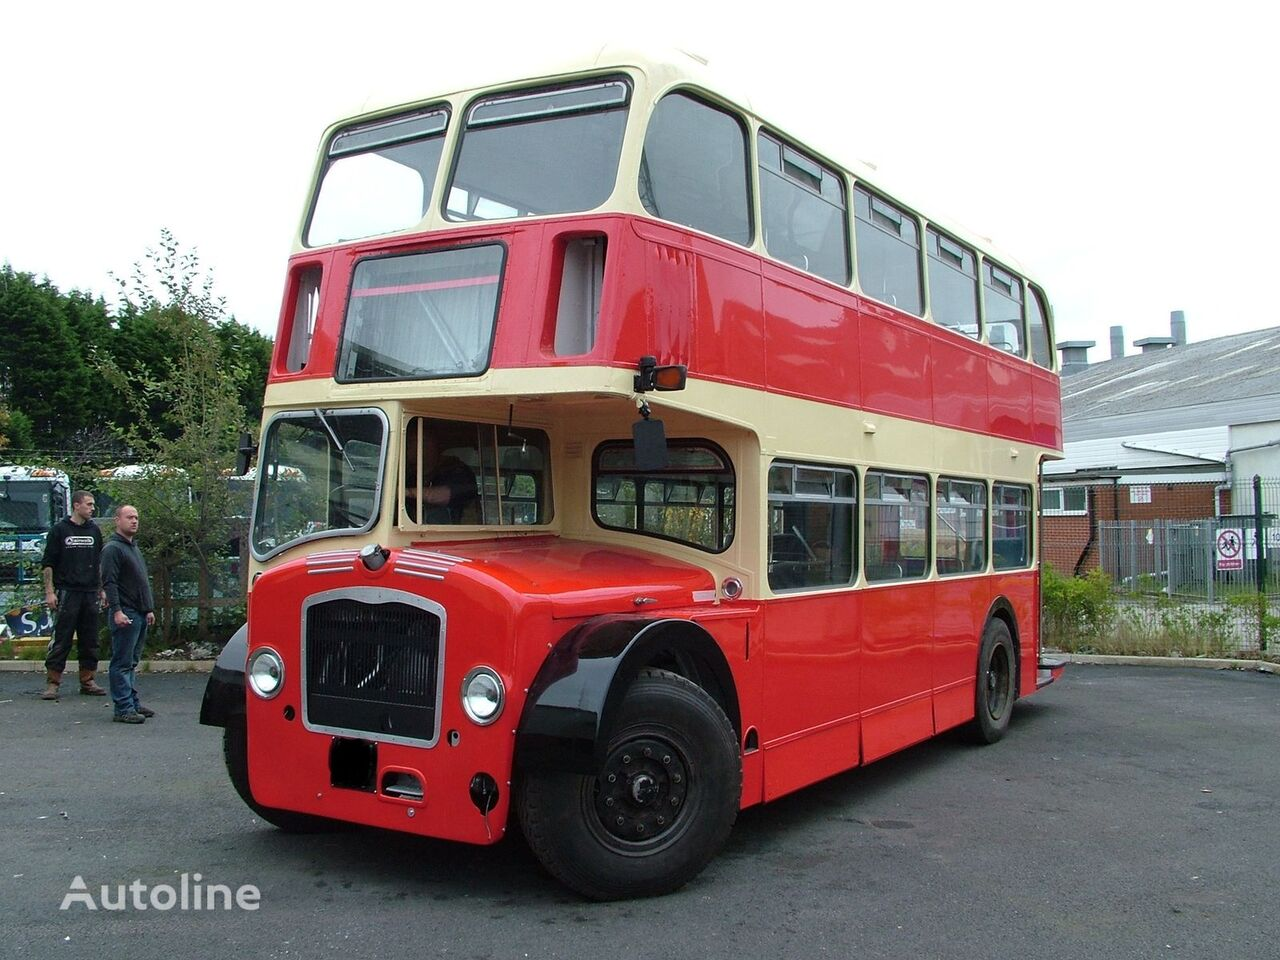 Bristol Lodekka LDS double decker bus